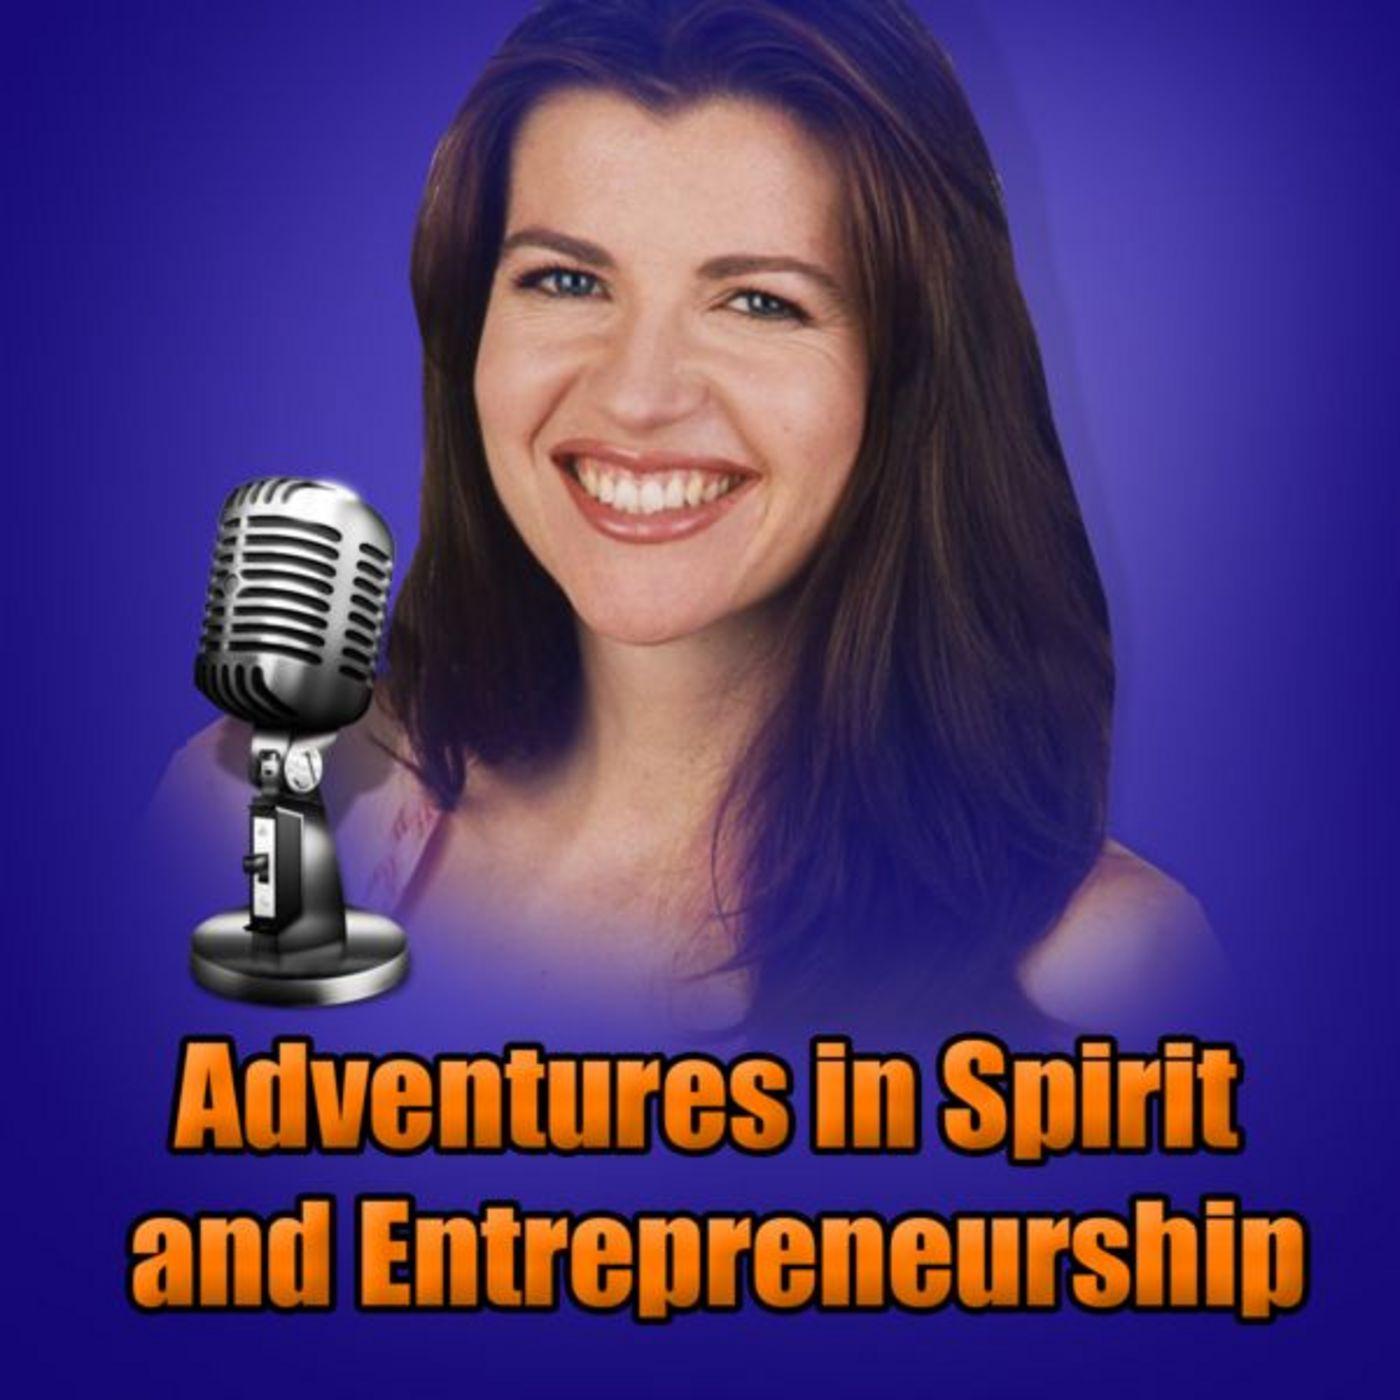 Adventures in Spirit & Entrepreneurship by Natasha Senkovich